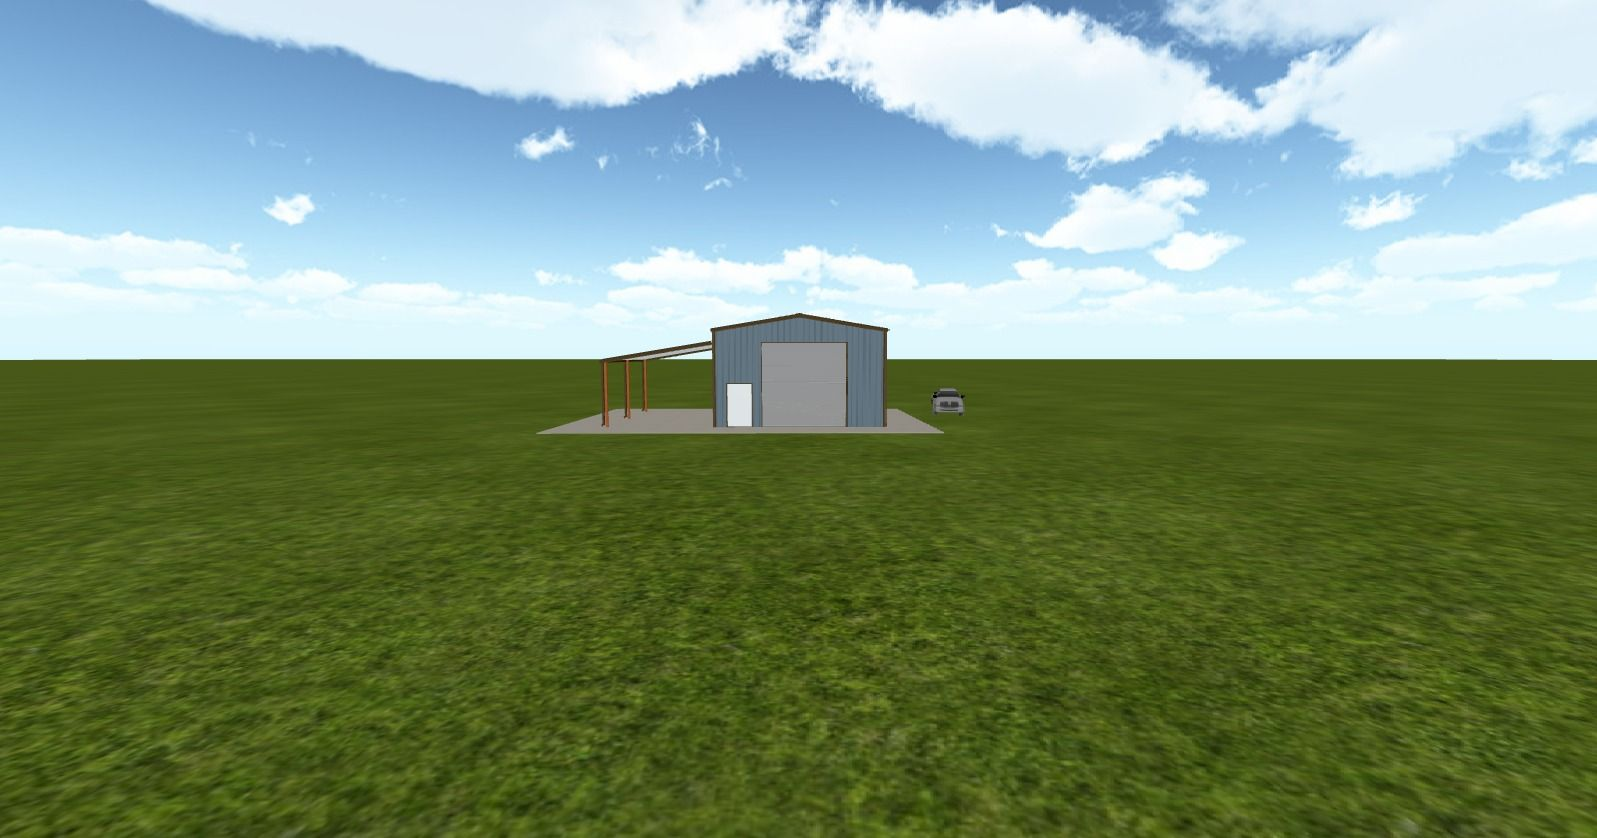 Cool 3D #marketing http://ift.tt/2gPYRI6 #barn #workshop #greenhouse #garage #roofing #DIY